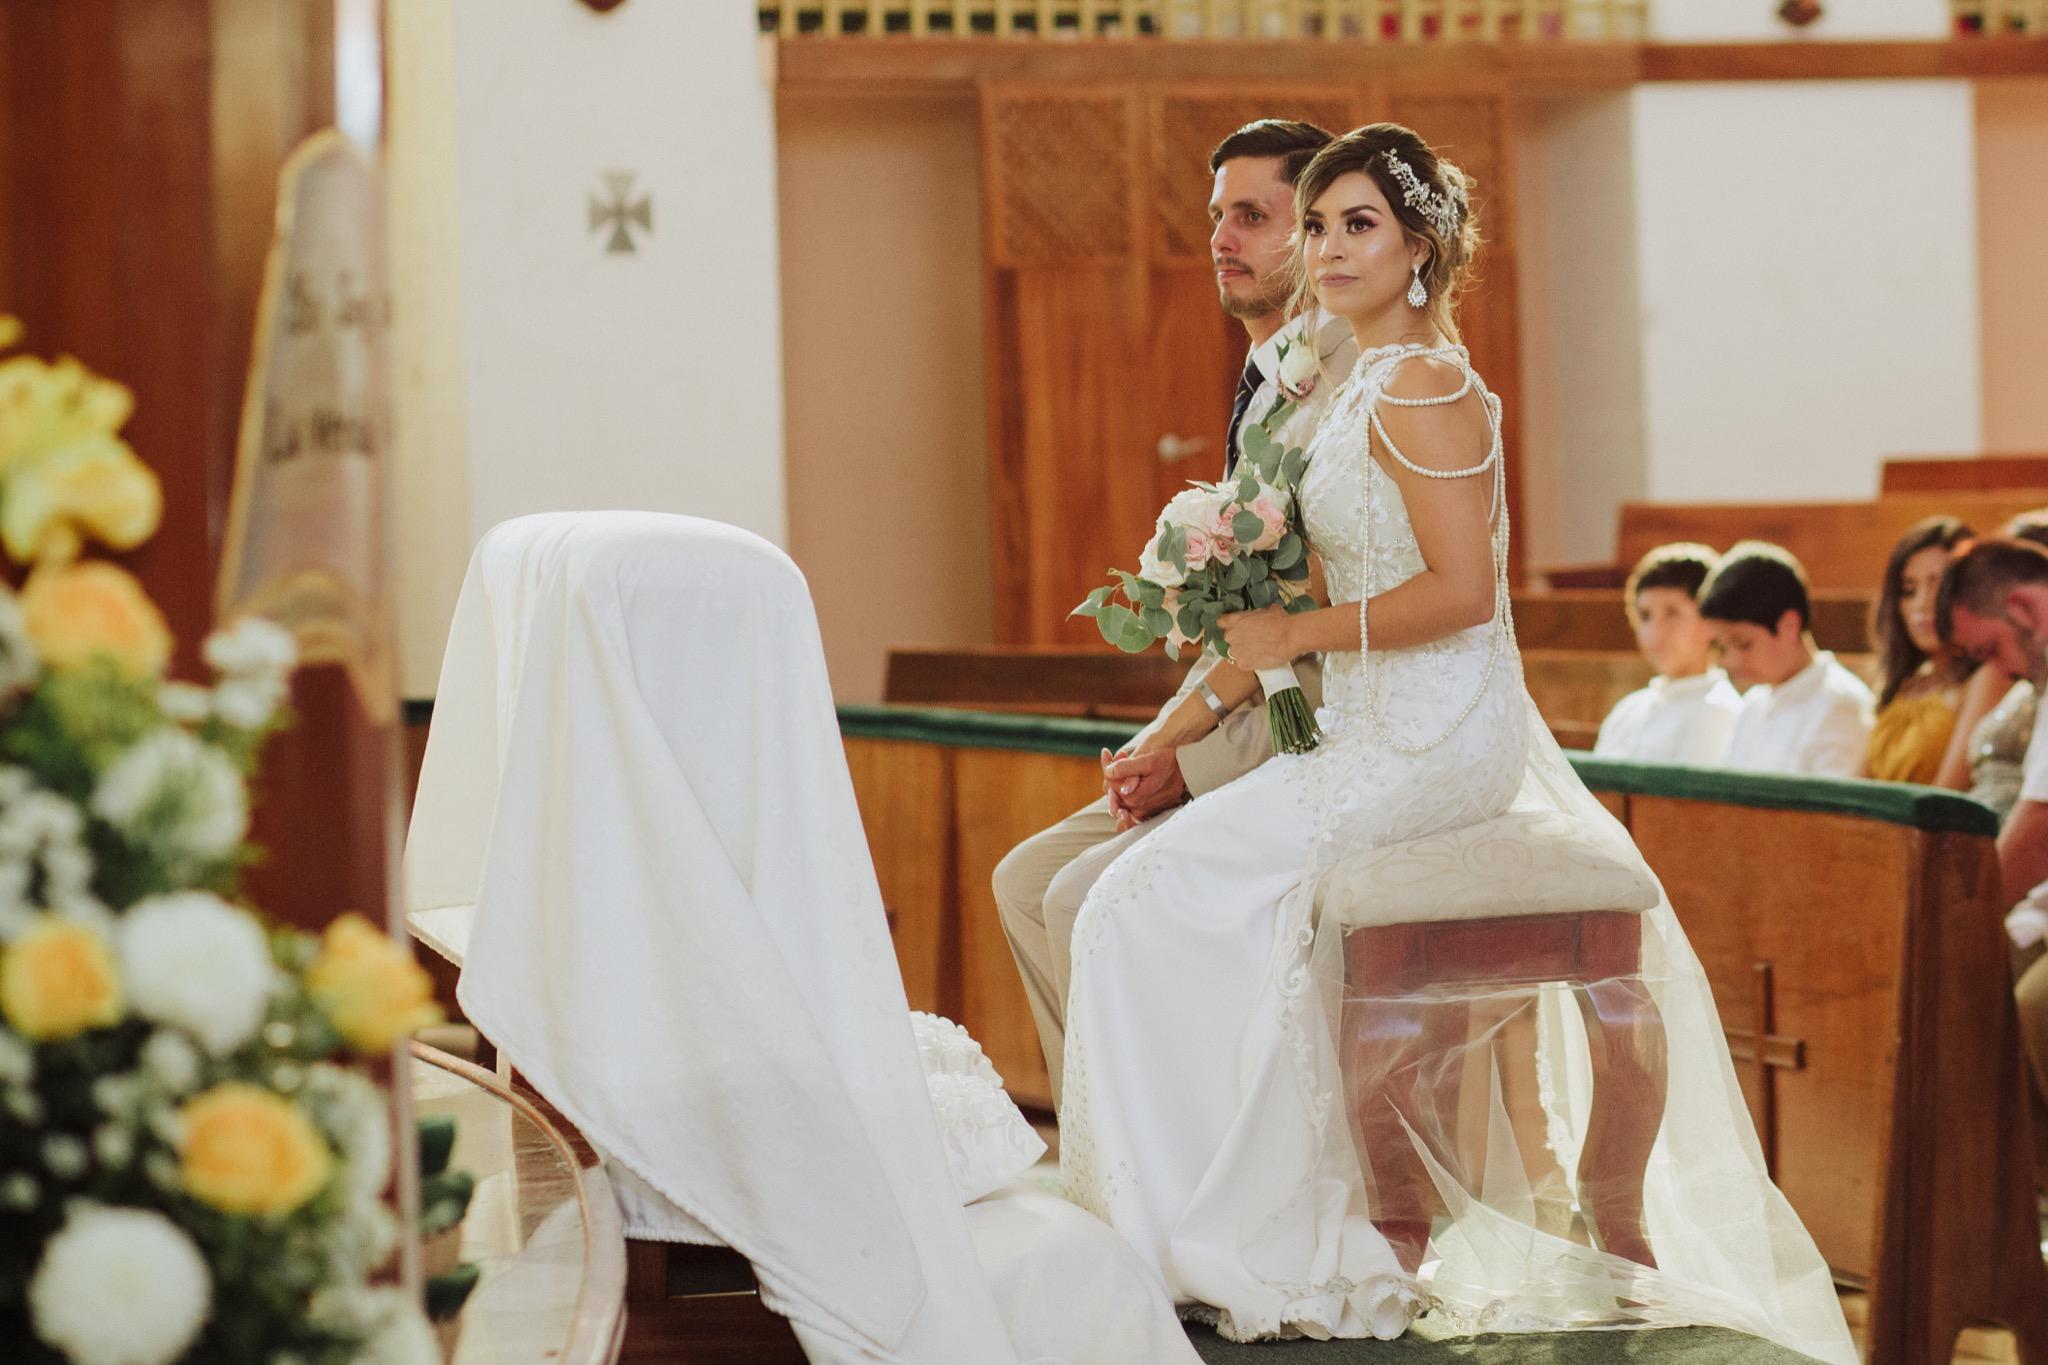 Javier_noriega_fotografo_bodas_profesional_zacatecas_mexico_mazatlan_sinaloa_photographer_weddings22